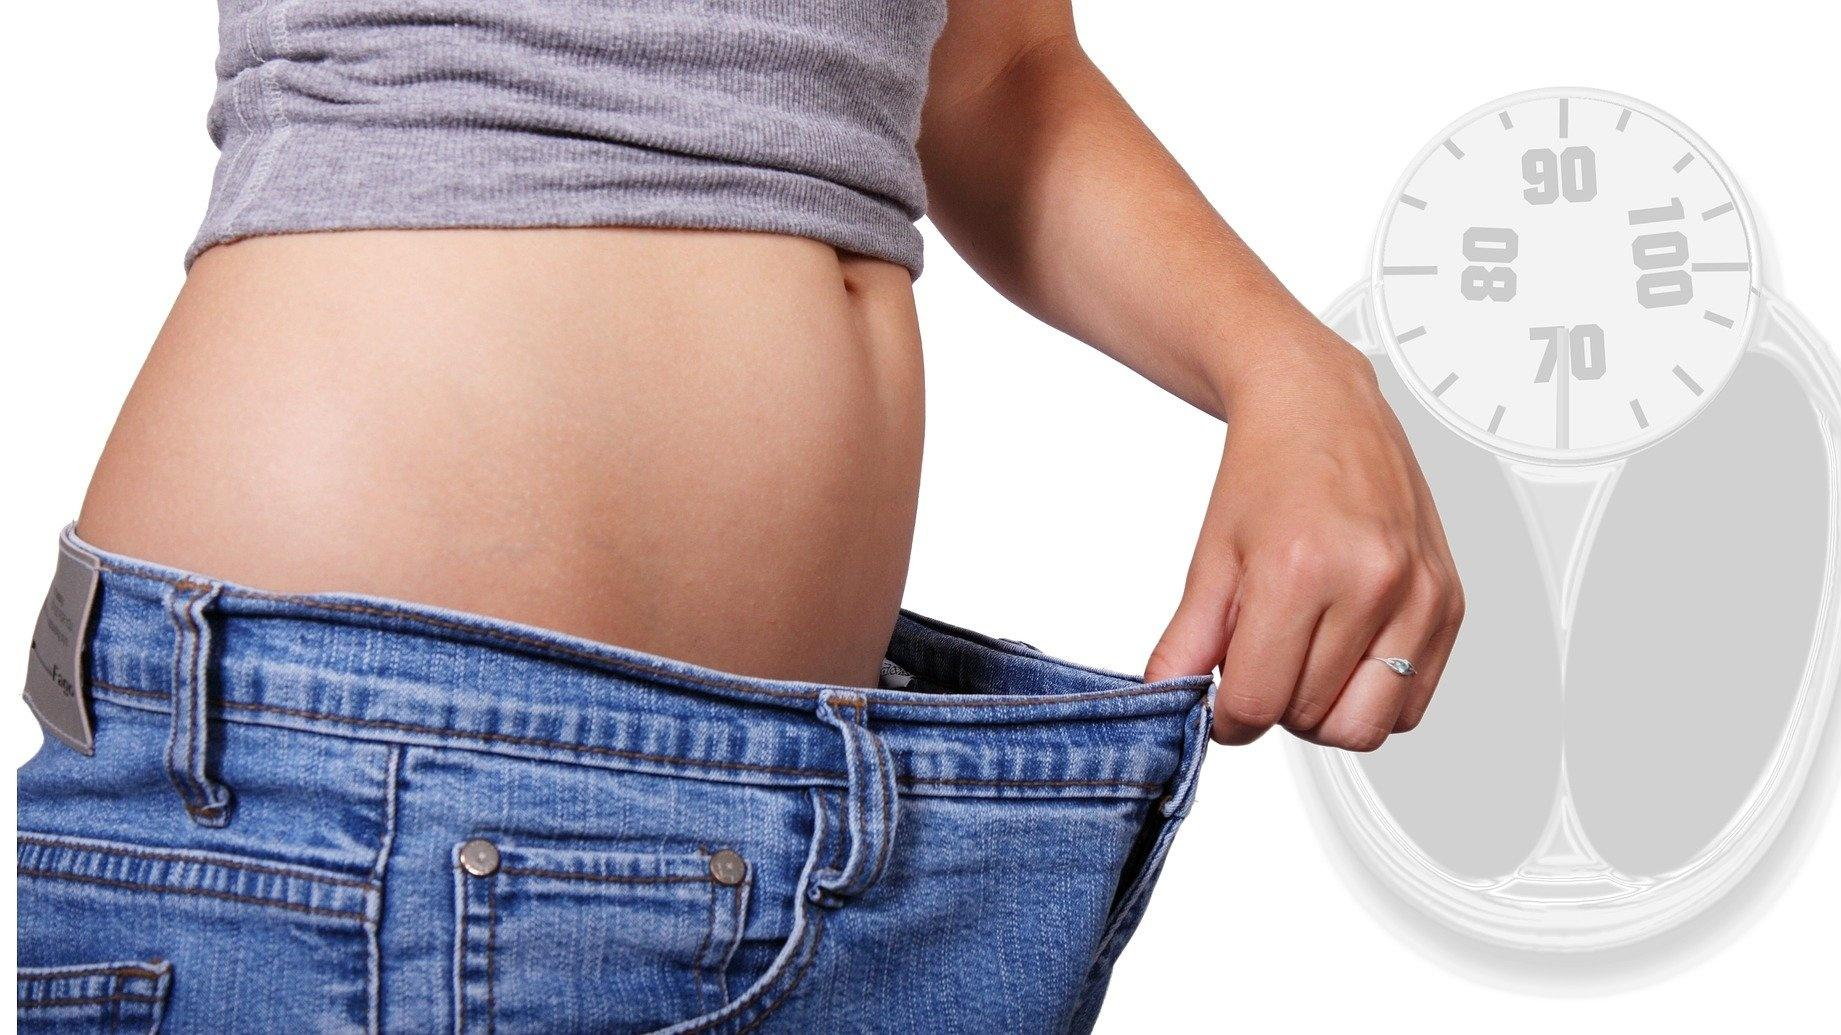 500 Kalorien verbrennen - so geht's ganz schnell